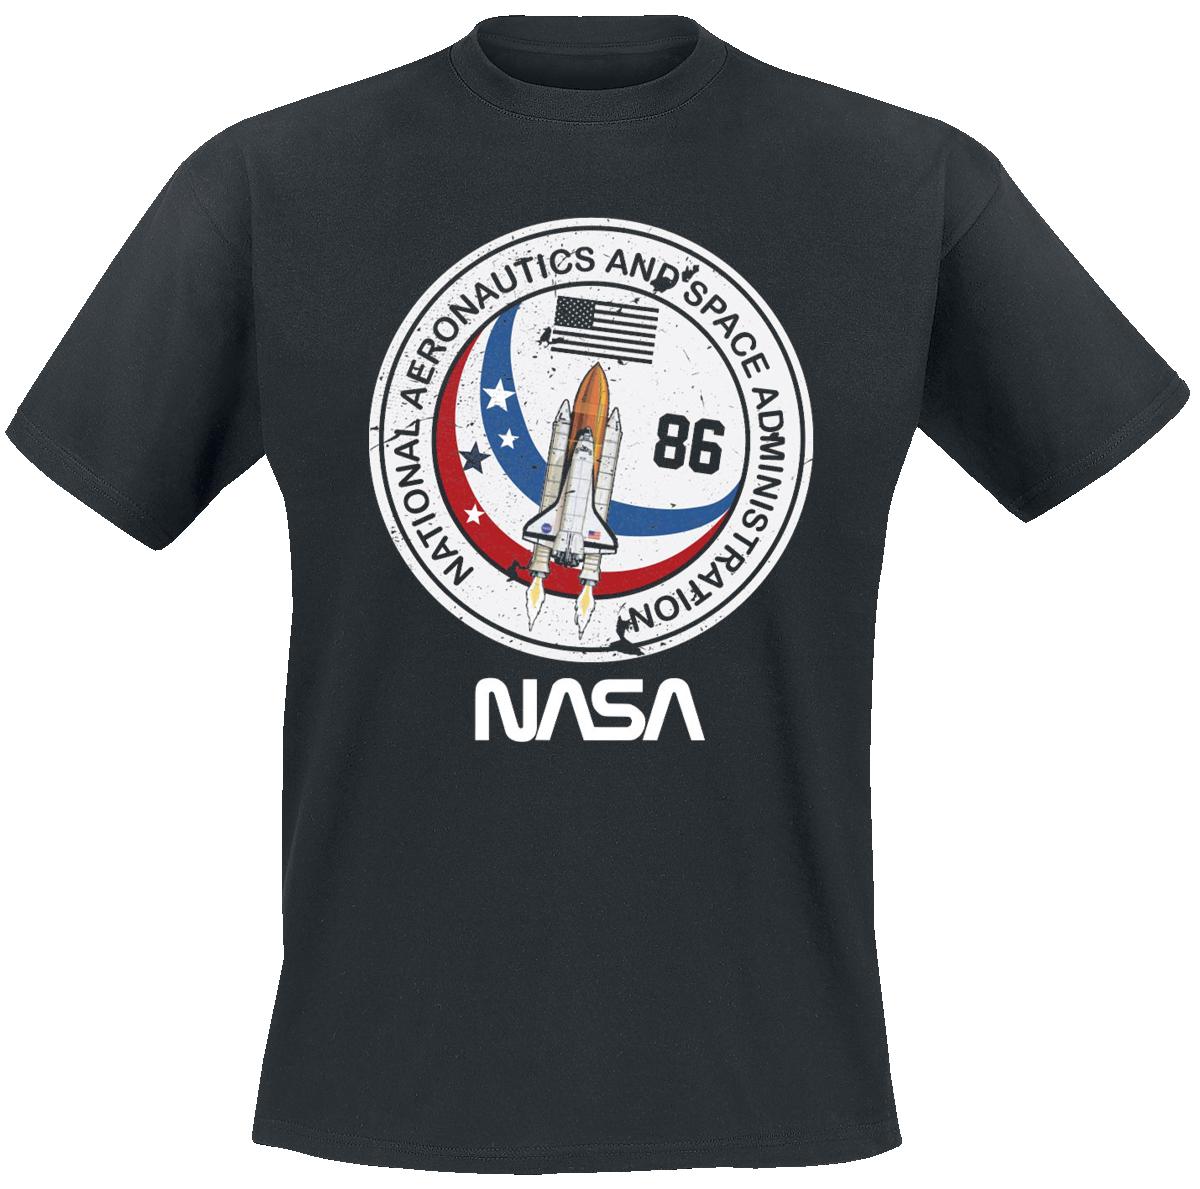 NASA - Shuttle 86 - T-Shirt - black image